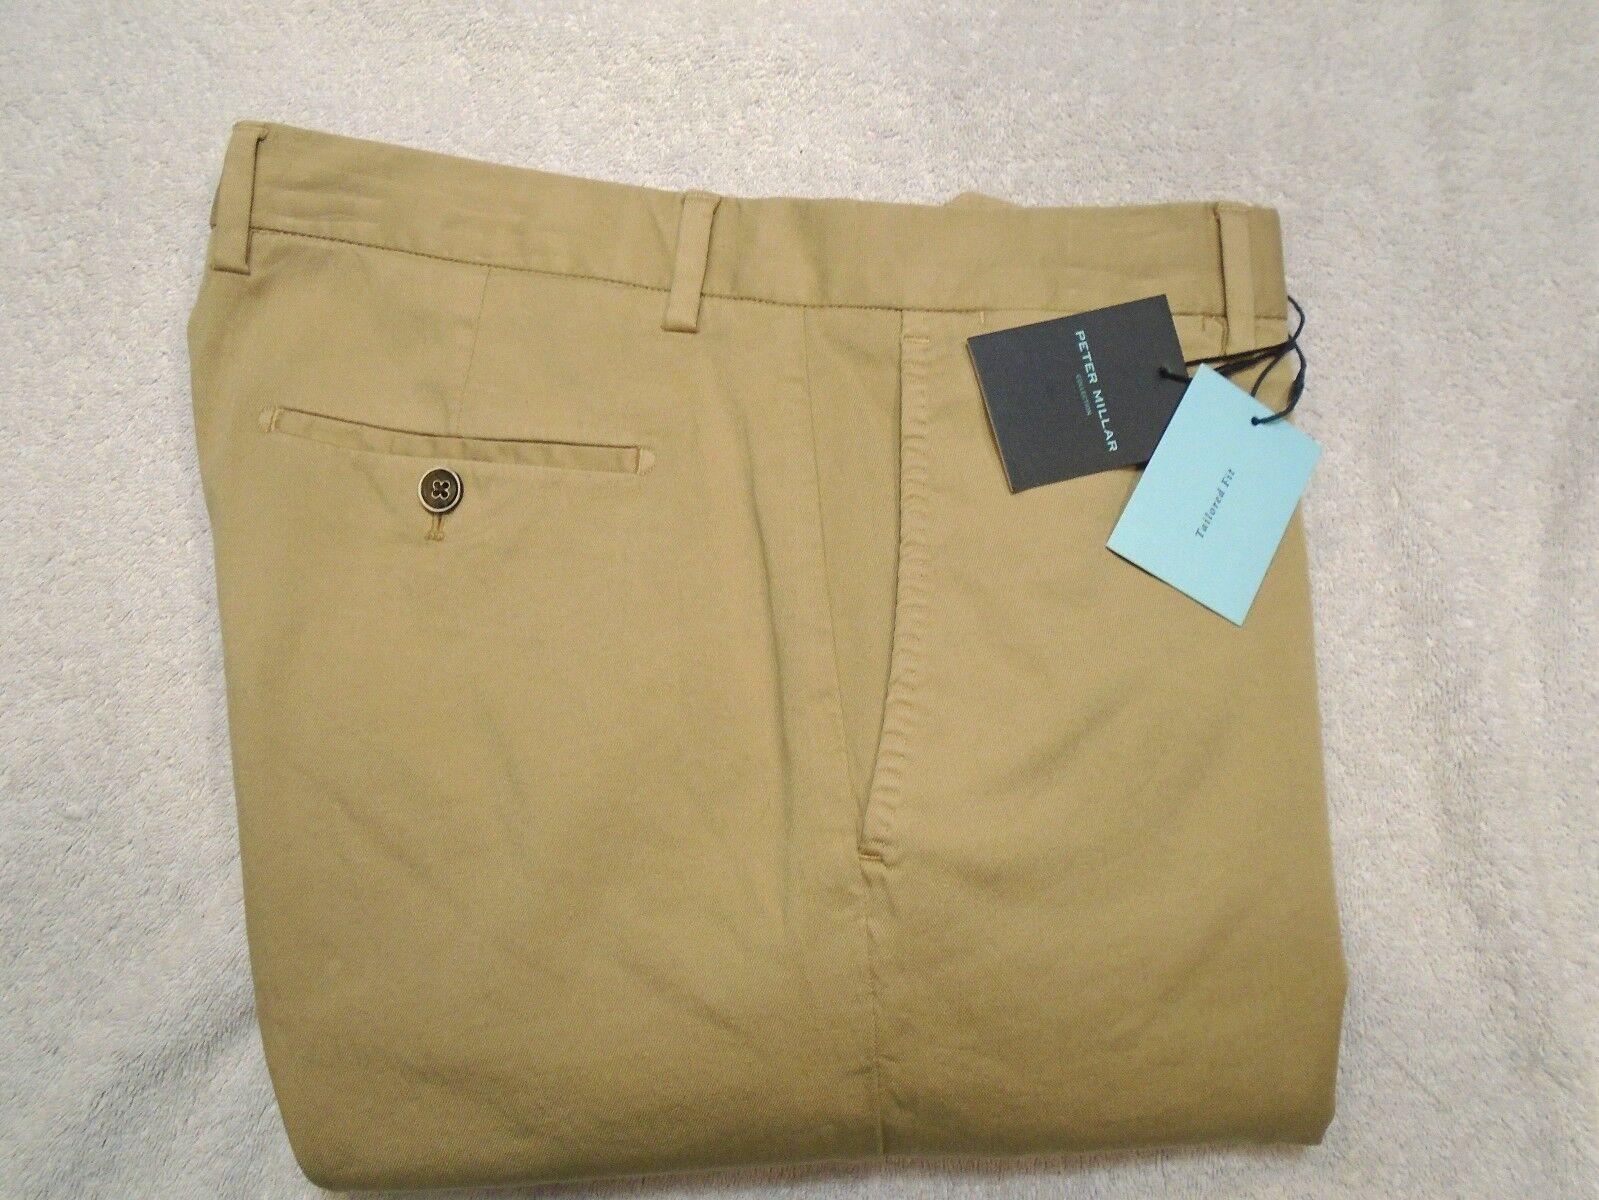 Peter Millar Collection Cotton Blend Twill Pants NWT  34 x 36 Khaki Tan